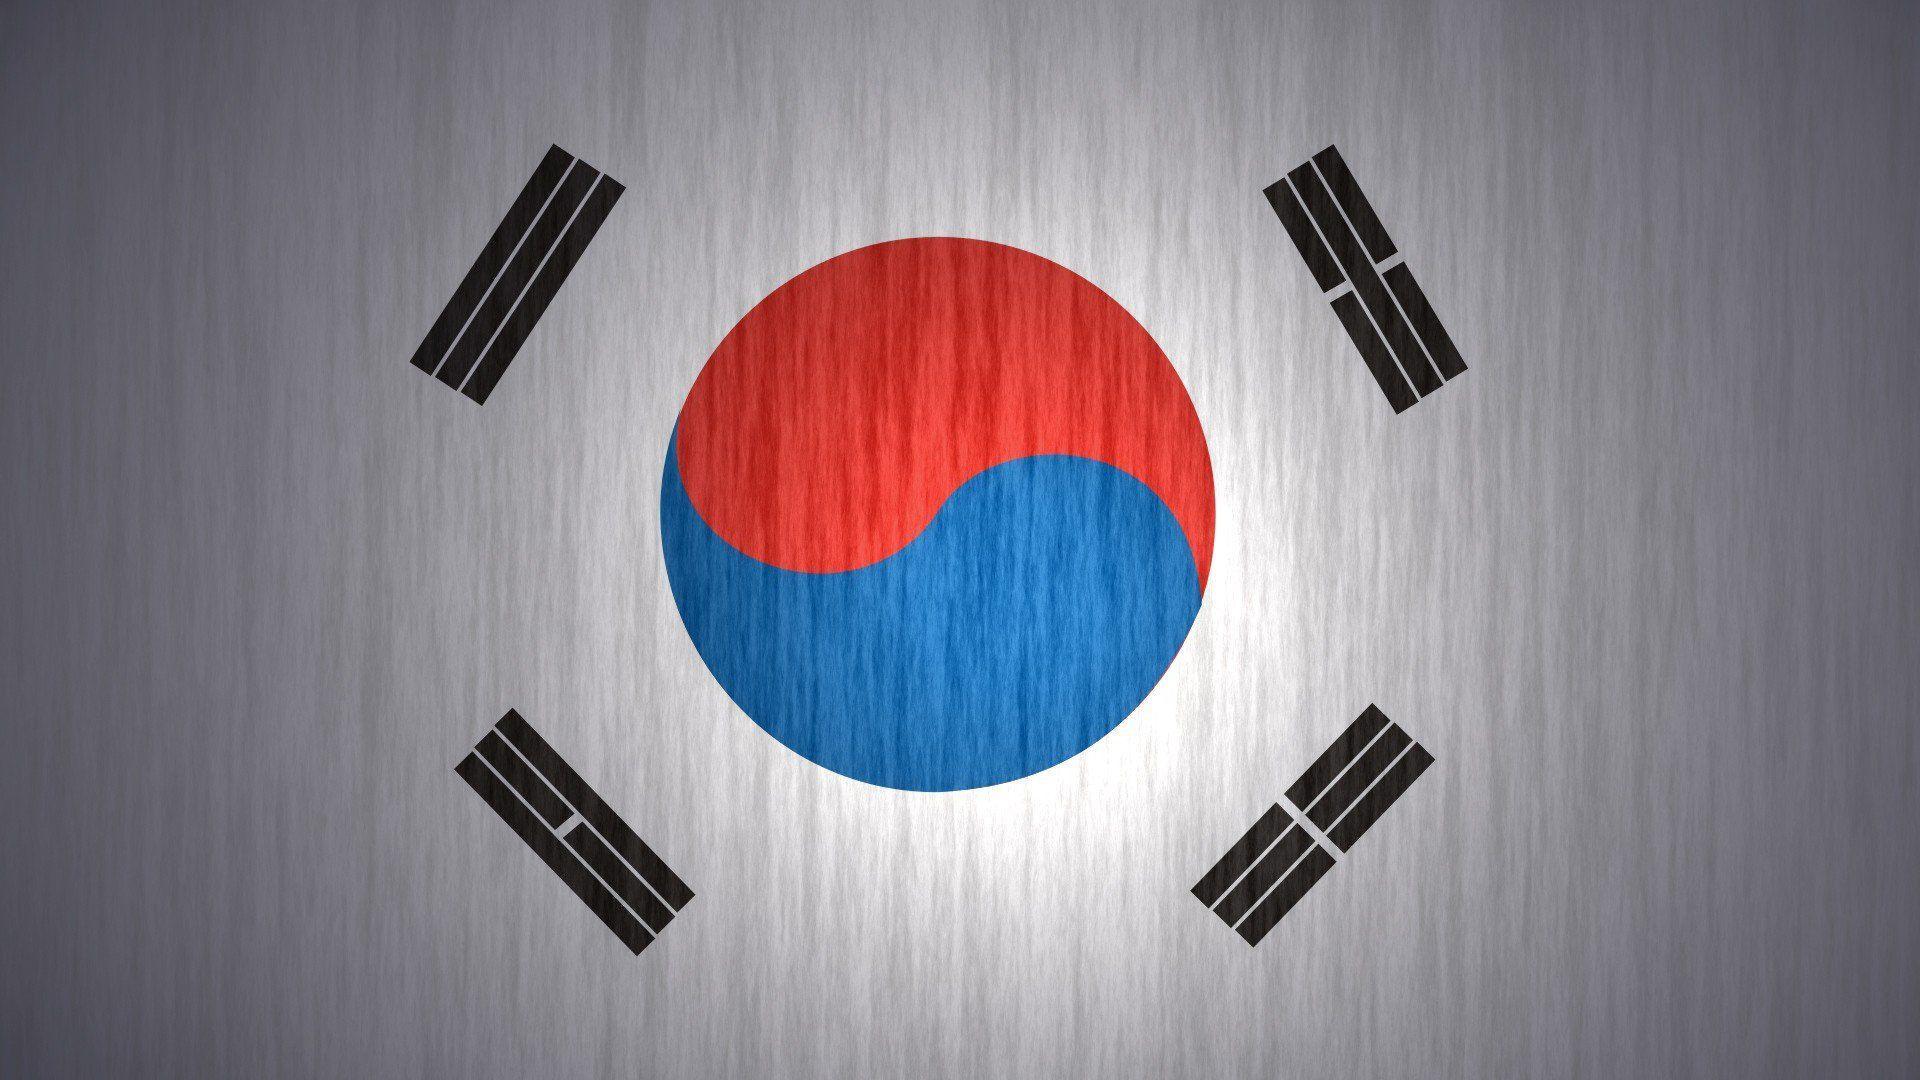 South Korea Flag Wallpapers Top Free South Korea Flag